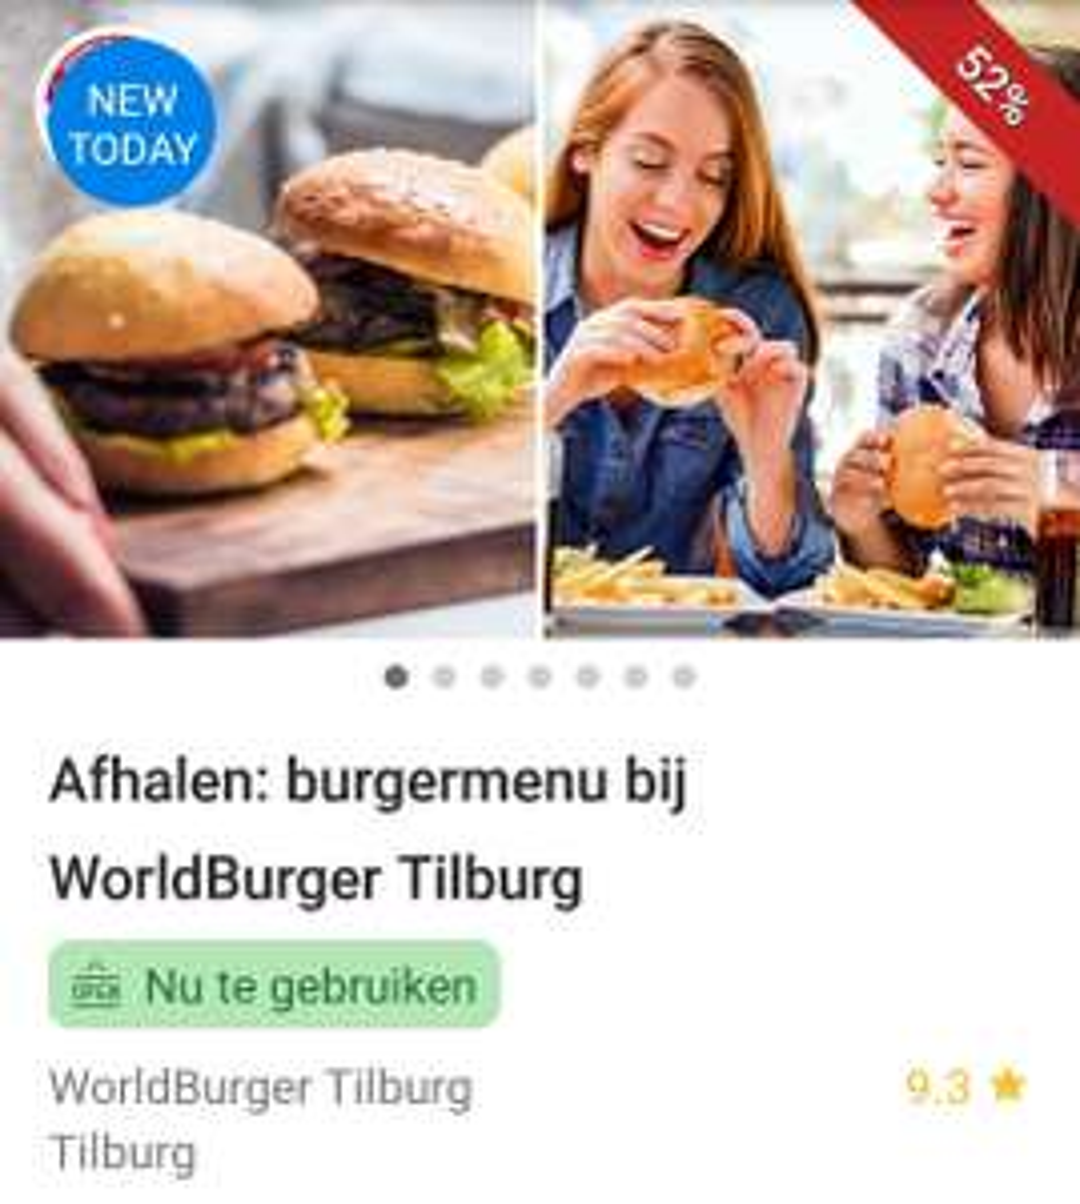 (LOKAAL)Burgermenu bij Worldburger in Tilburg